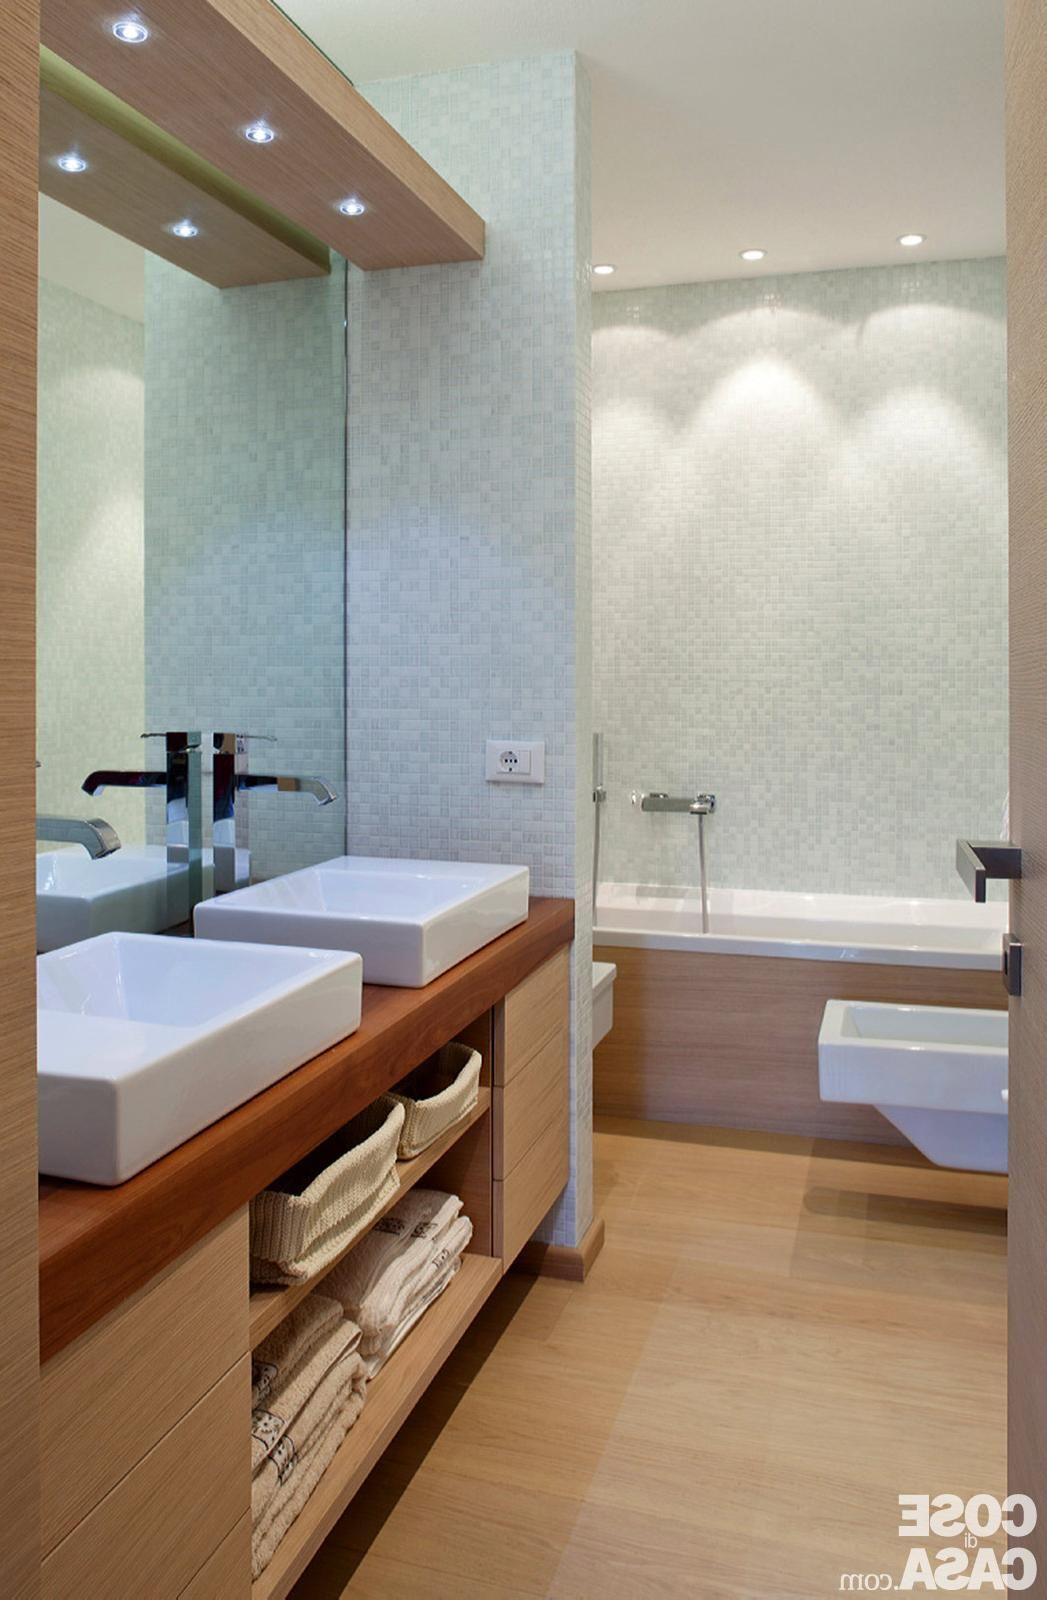 Minimalist Modern Master Bathroom Interior Design With Soft Lighting on custom luxury bathroom designs, elegant master bathroom shower designs, modern 2 story house designs, modern master bathroom designs,